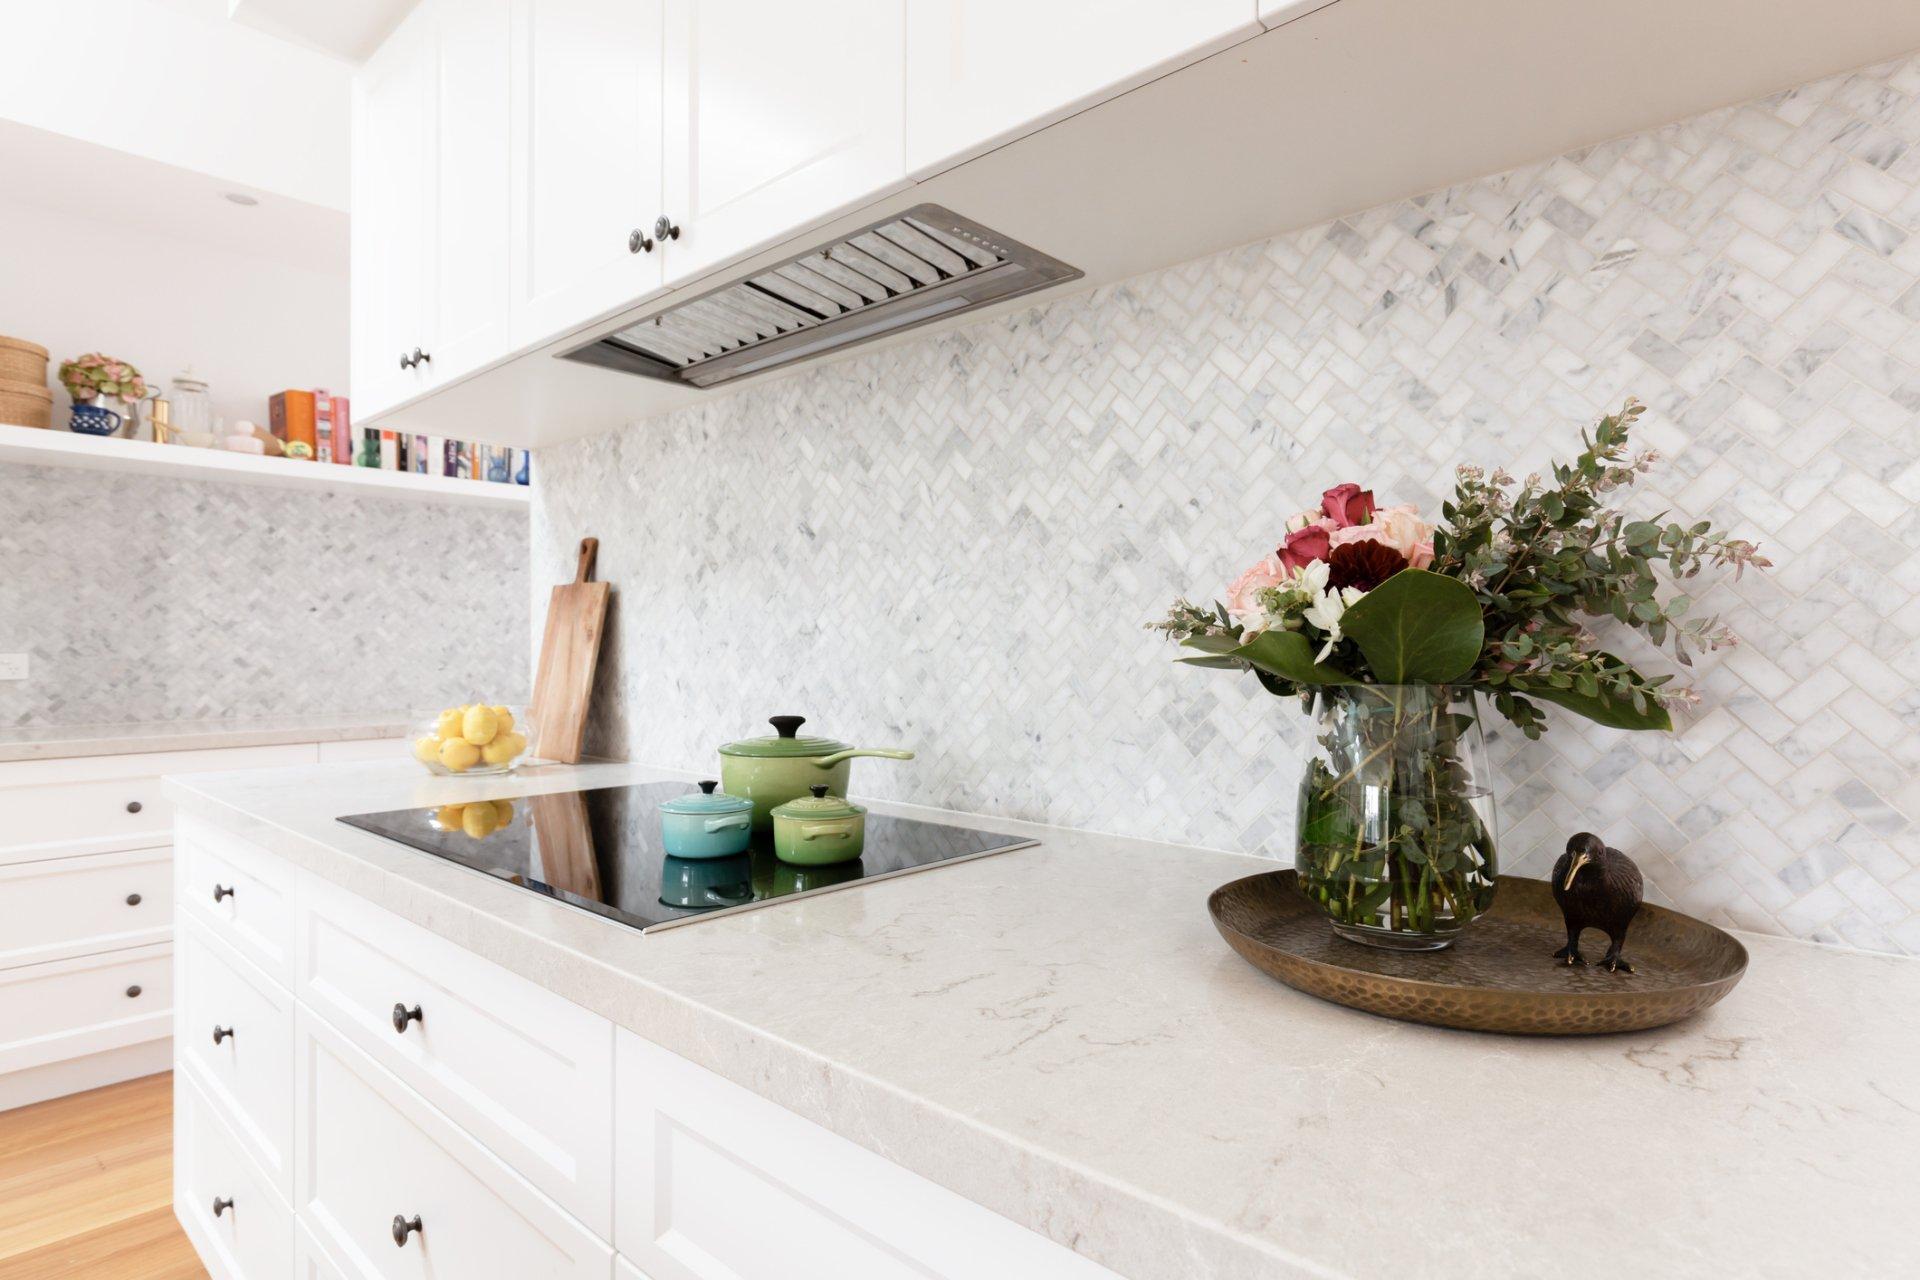 Home Design Services Great Bend Ks Kustom Floor Designs